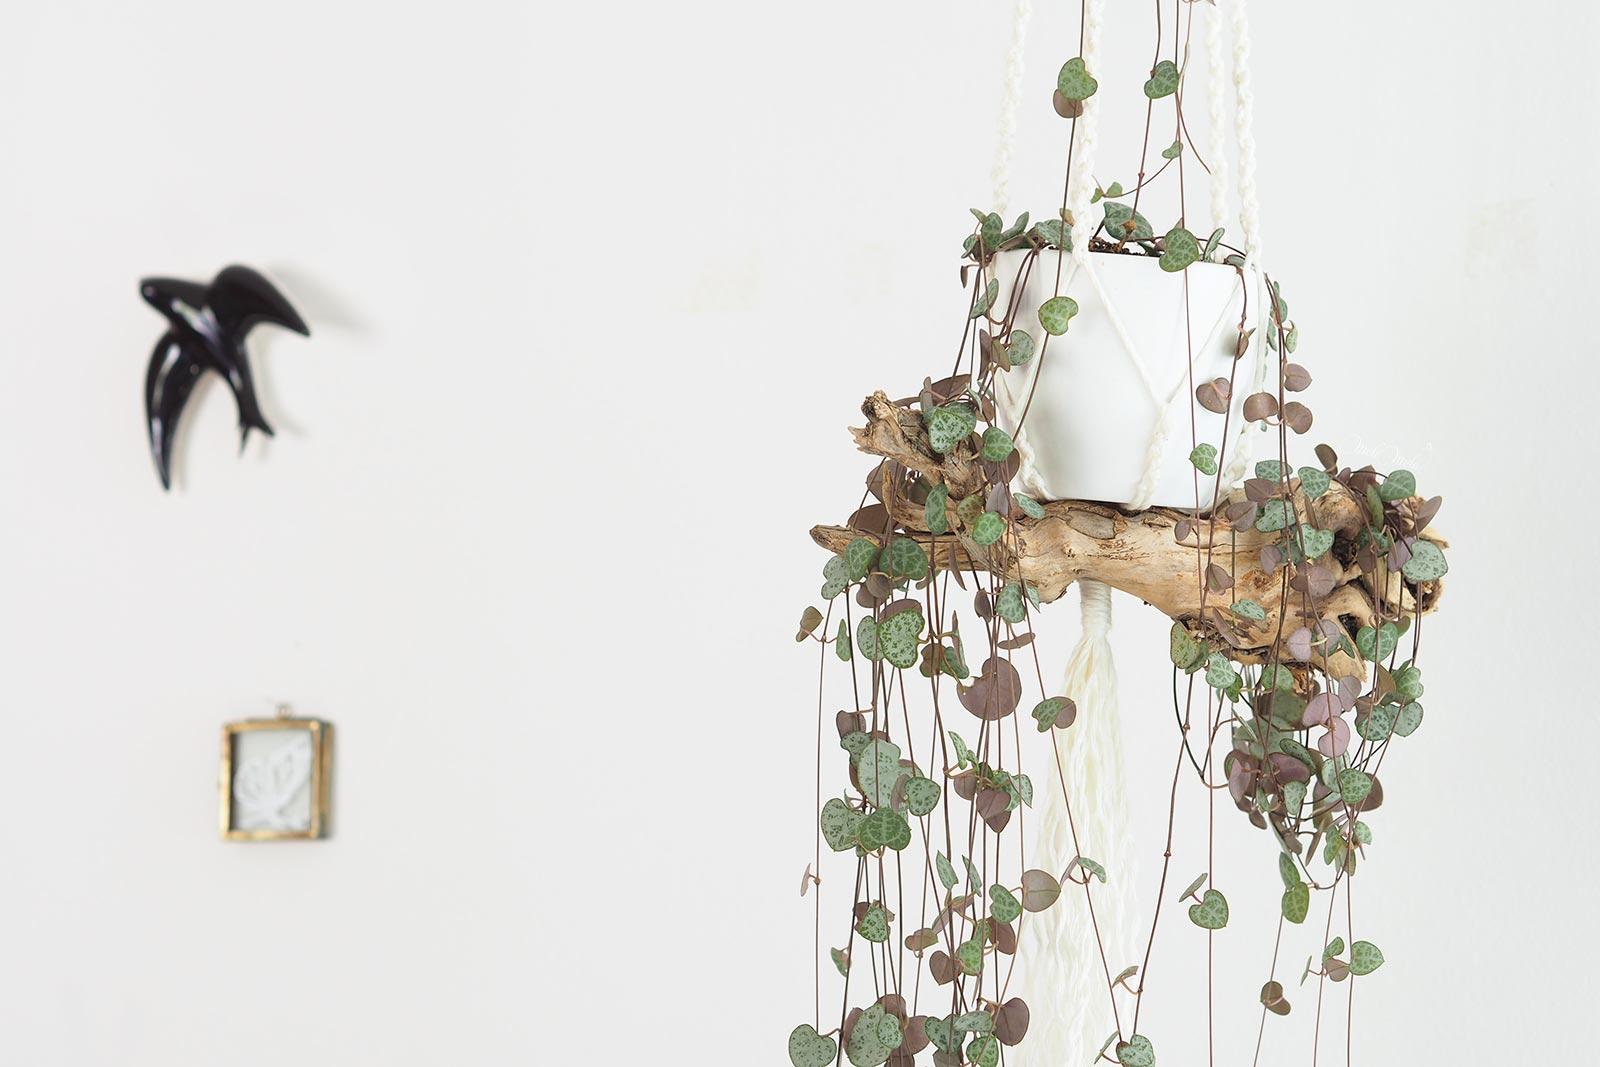 ceropegia-woodii-suspension-bois-trois-ans-laboutiquedemelimelo